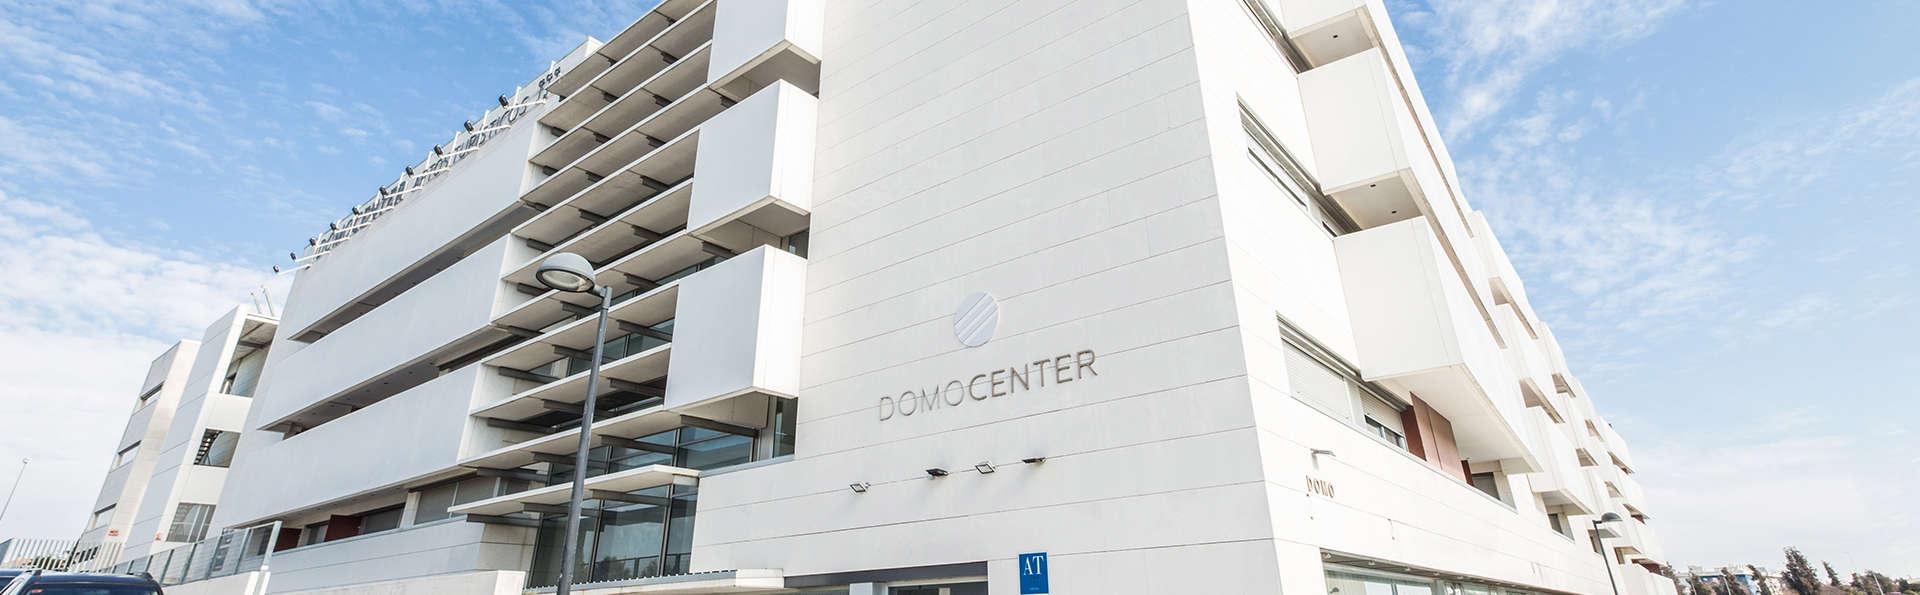 Apartamentos ELE Domocenter - EDIT_NEW_Front.jpg